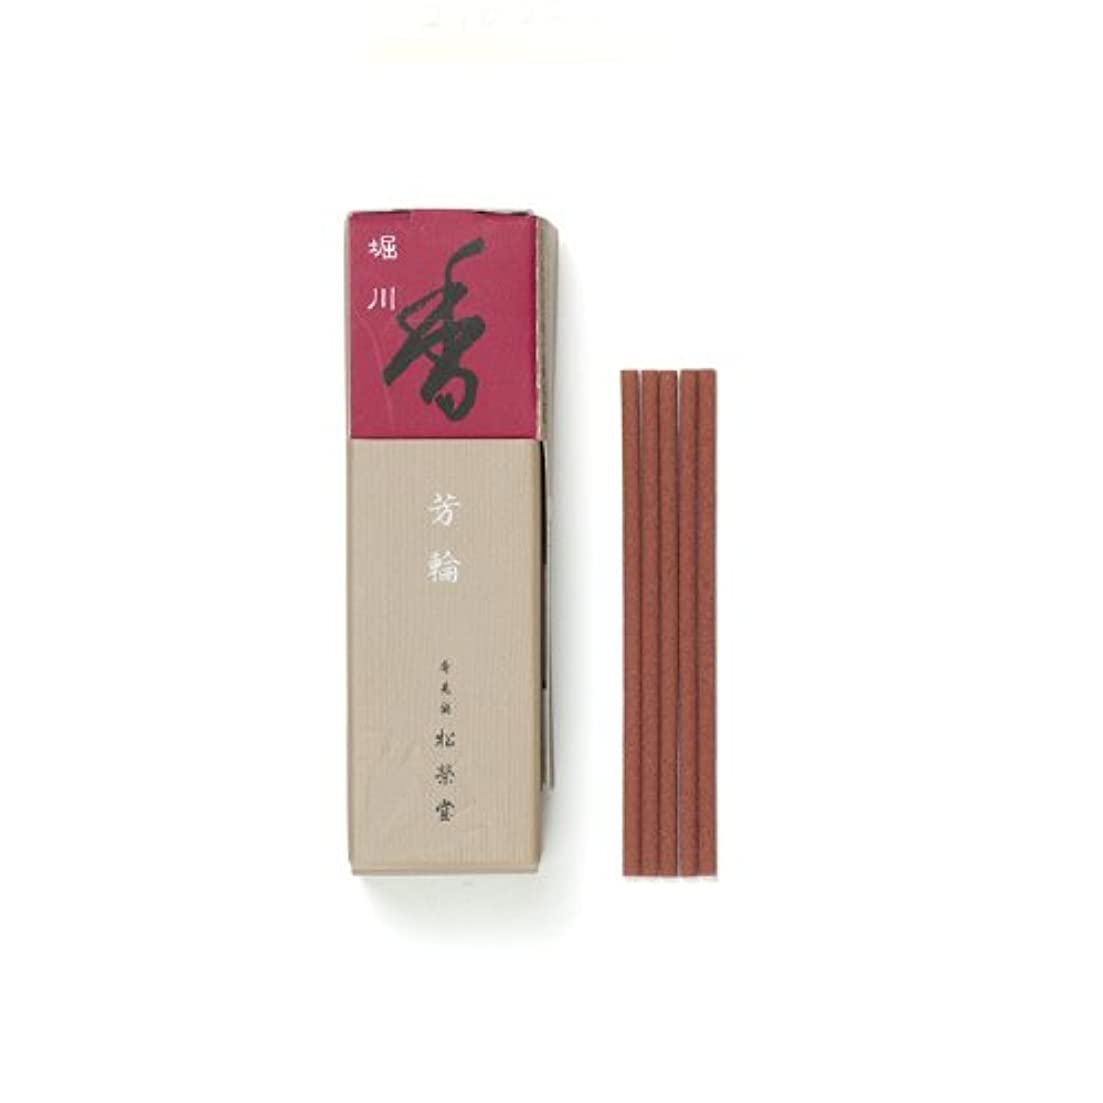 銘香芳輪 松栄堂のお香 芳輪堀川 ST20本入 簡易香立付 #210223